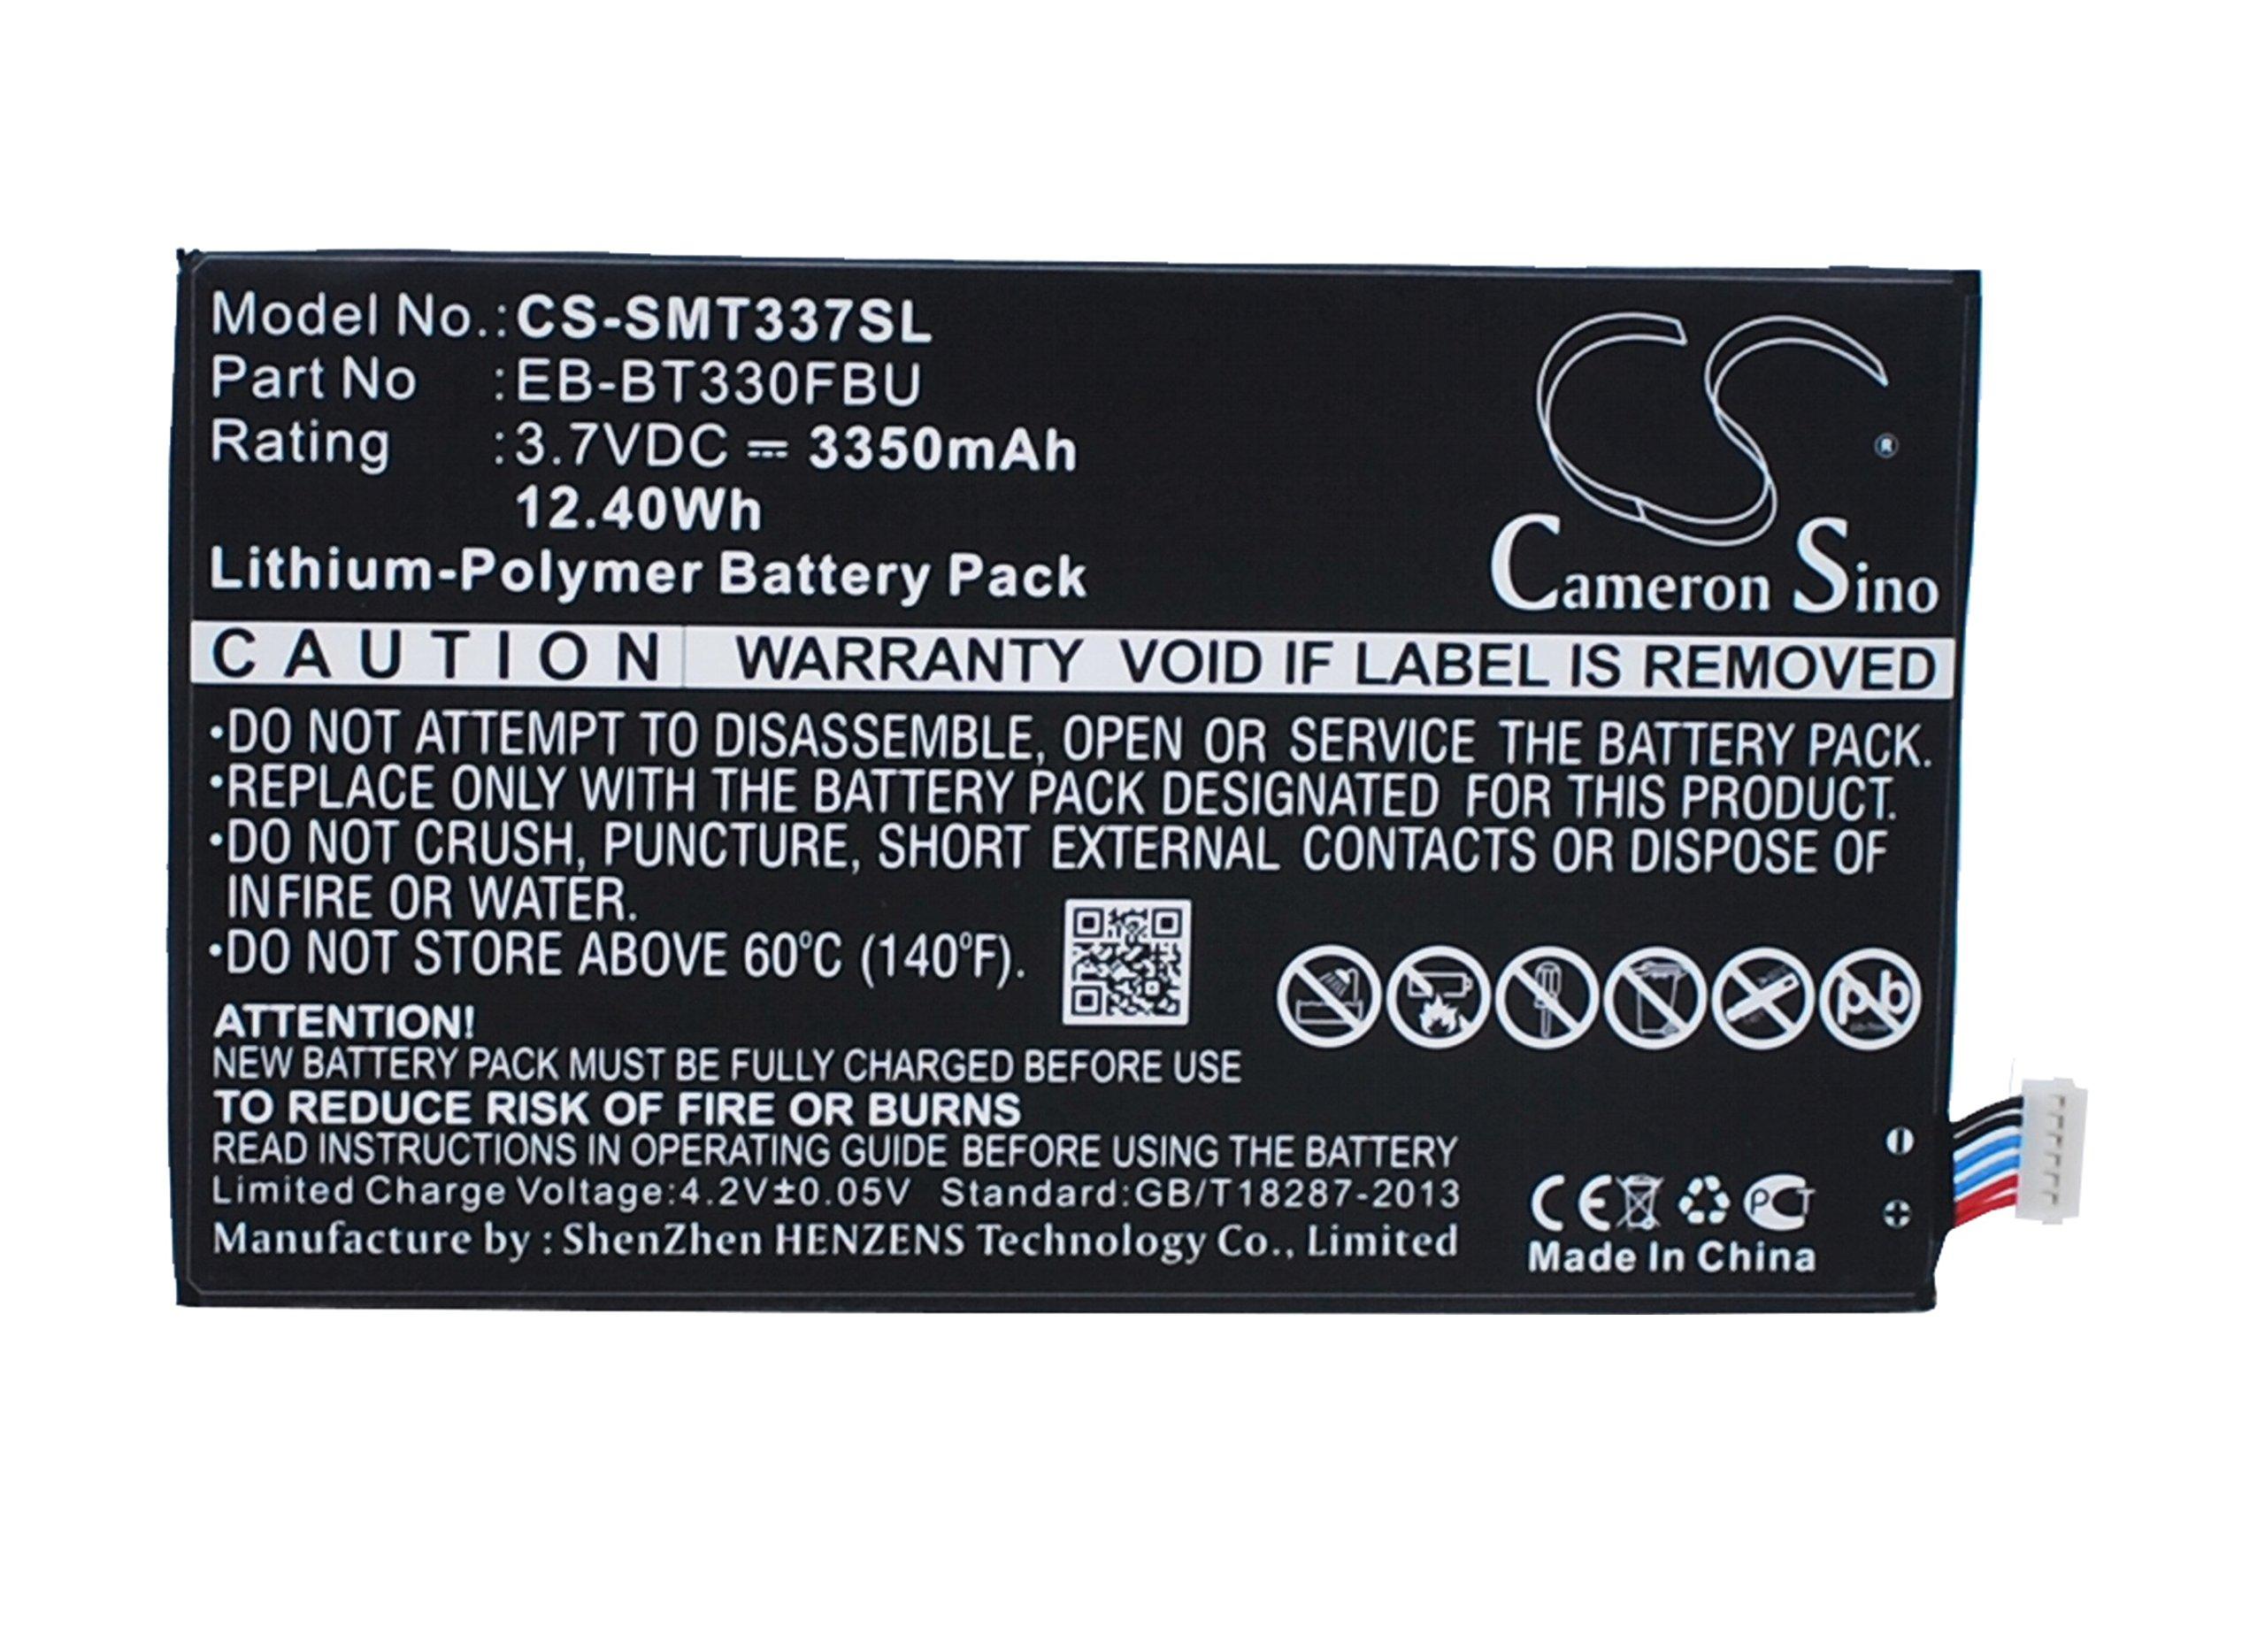 3350mAh X-Longer Tablet Battery for Samsung Galaxy Tab 4 8.0, Galaxy Tab4 8.0'', SM-T330NU (EB-BT330FBU)